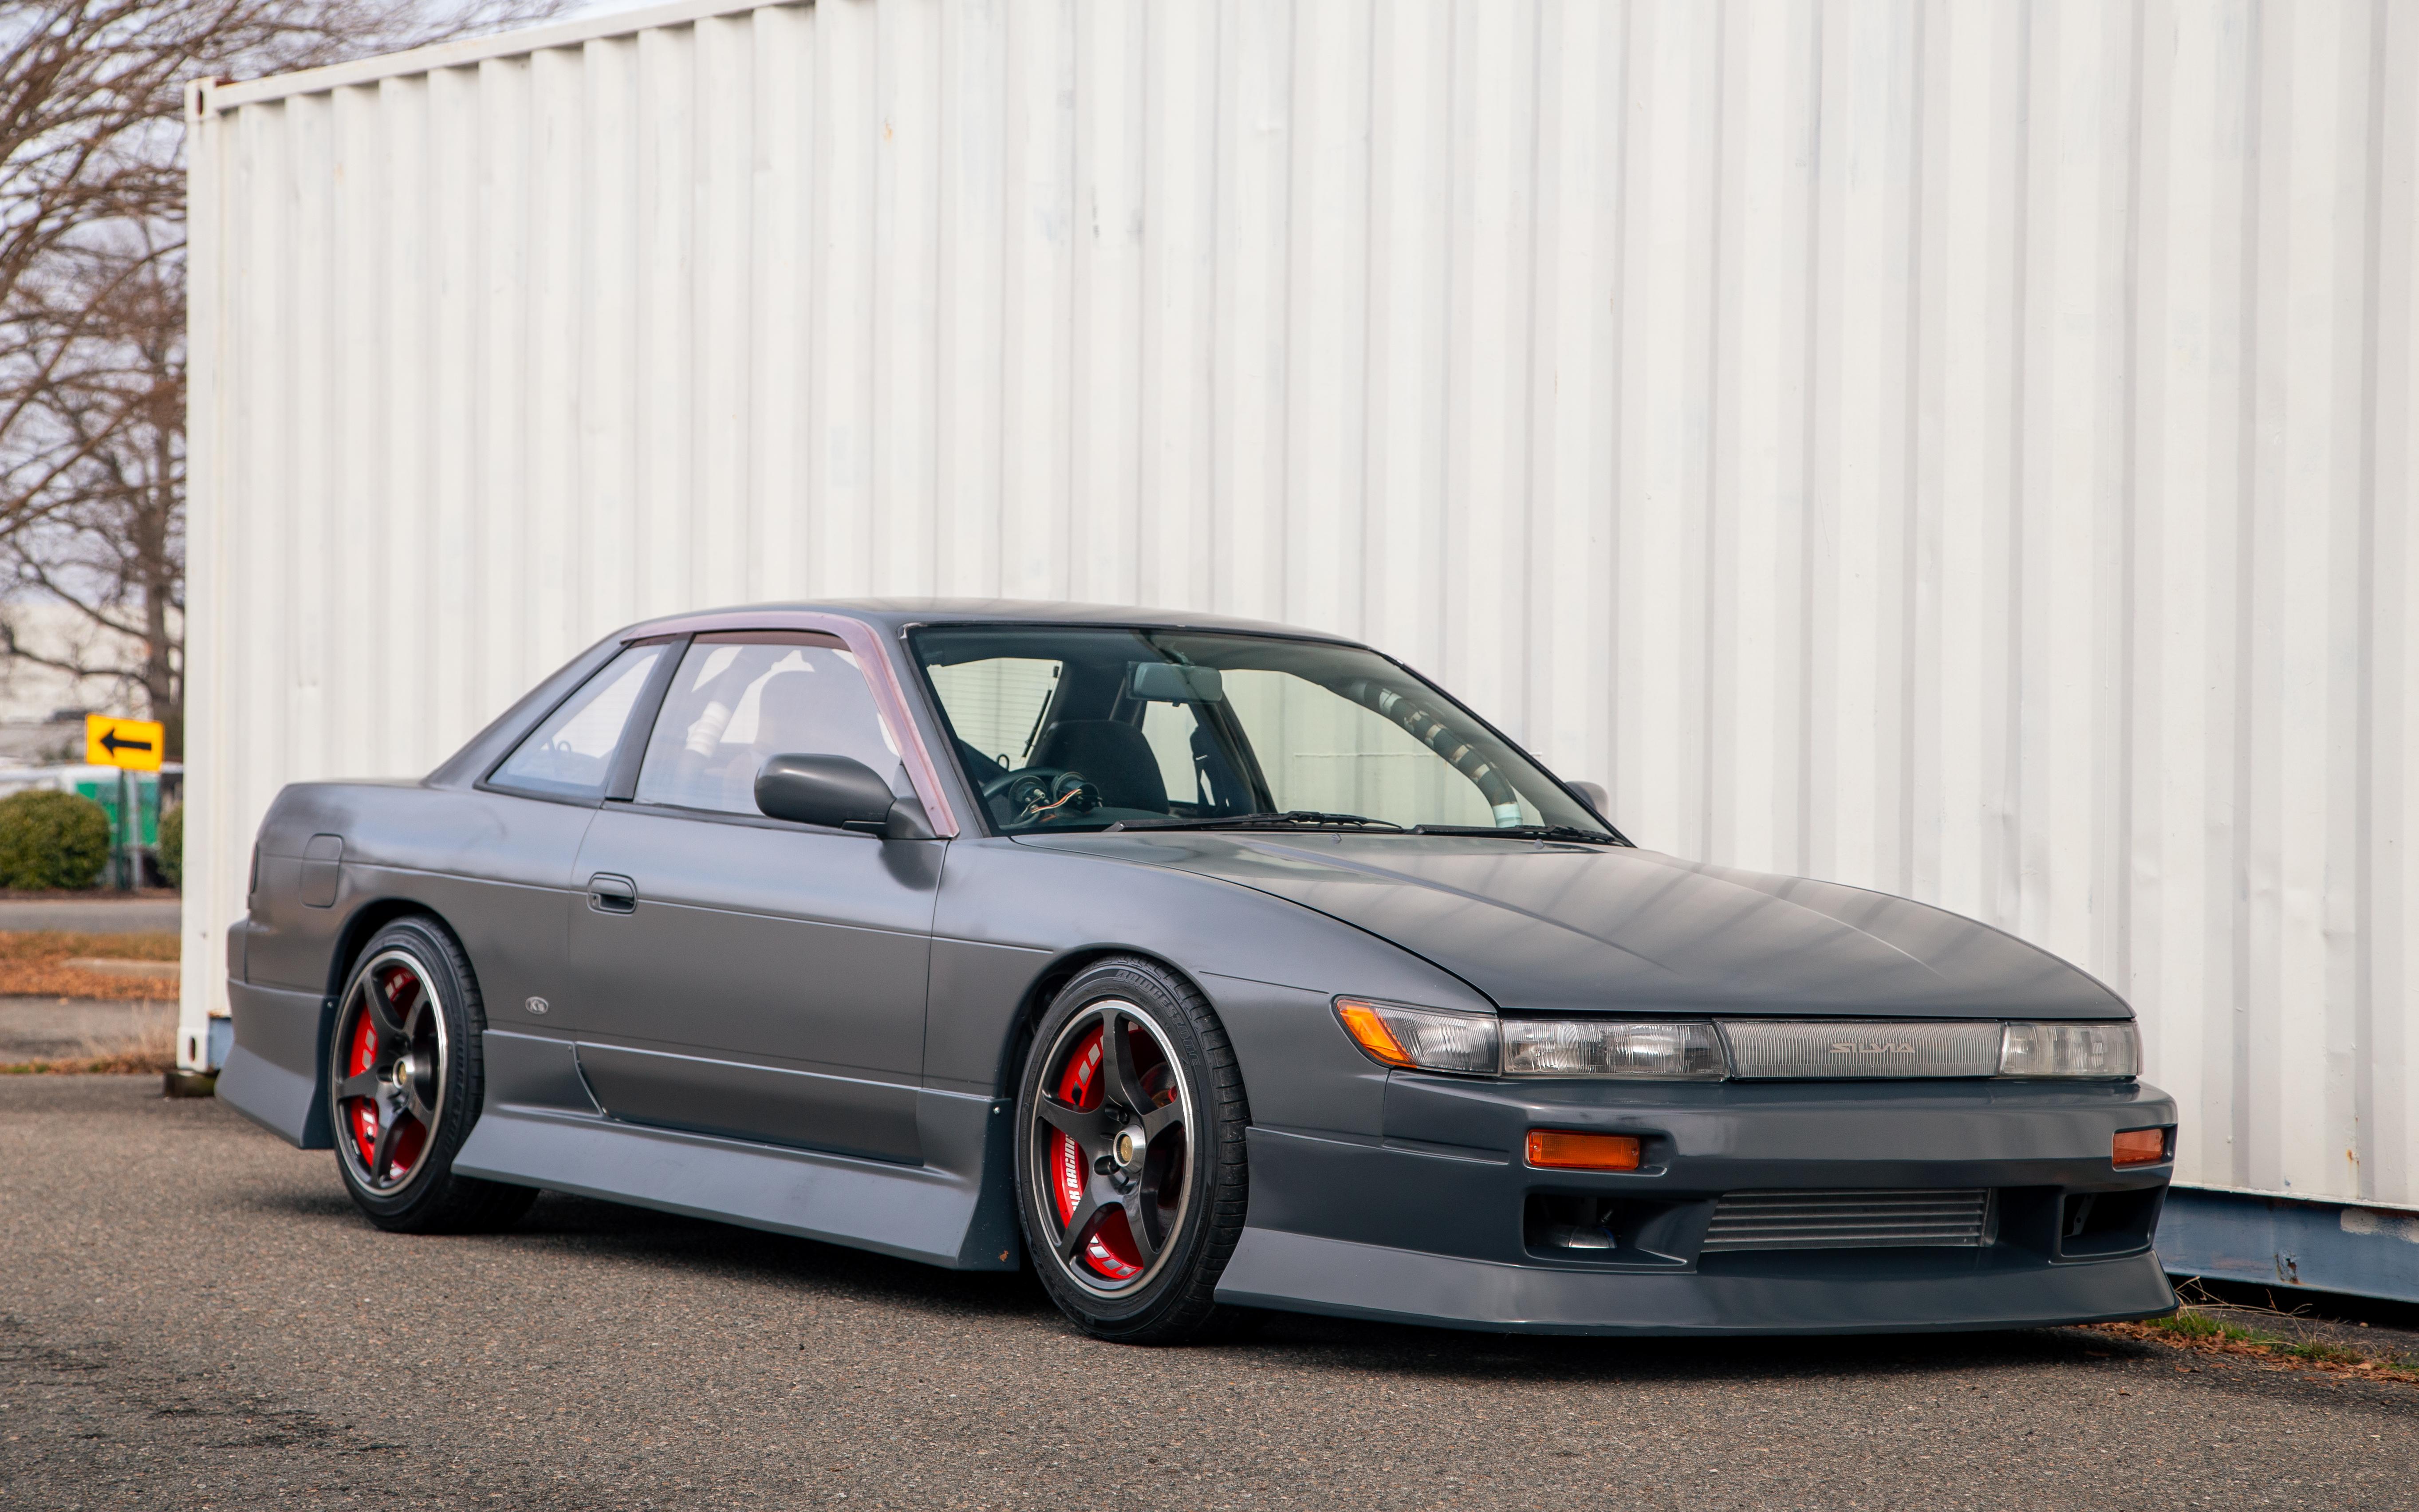 1992 Jdm Nissan Silvia K S Bn Sport Aero Nicely Modified Rhd S13 Coupe Imported Rhd Cars J Spec Auto Sports